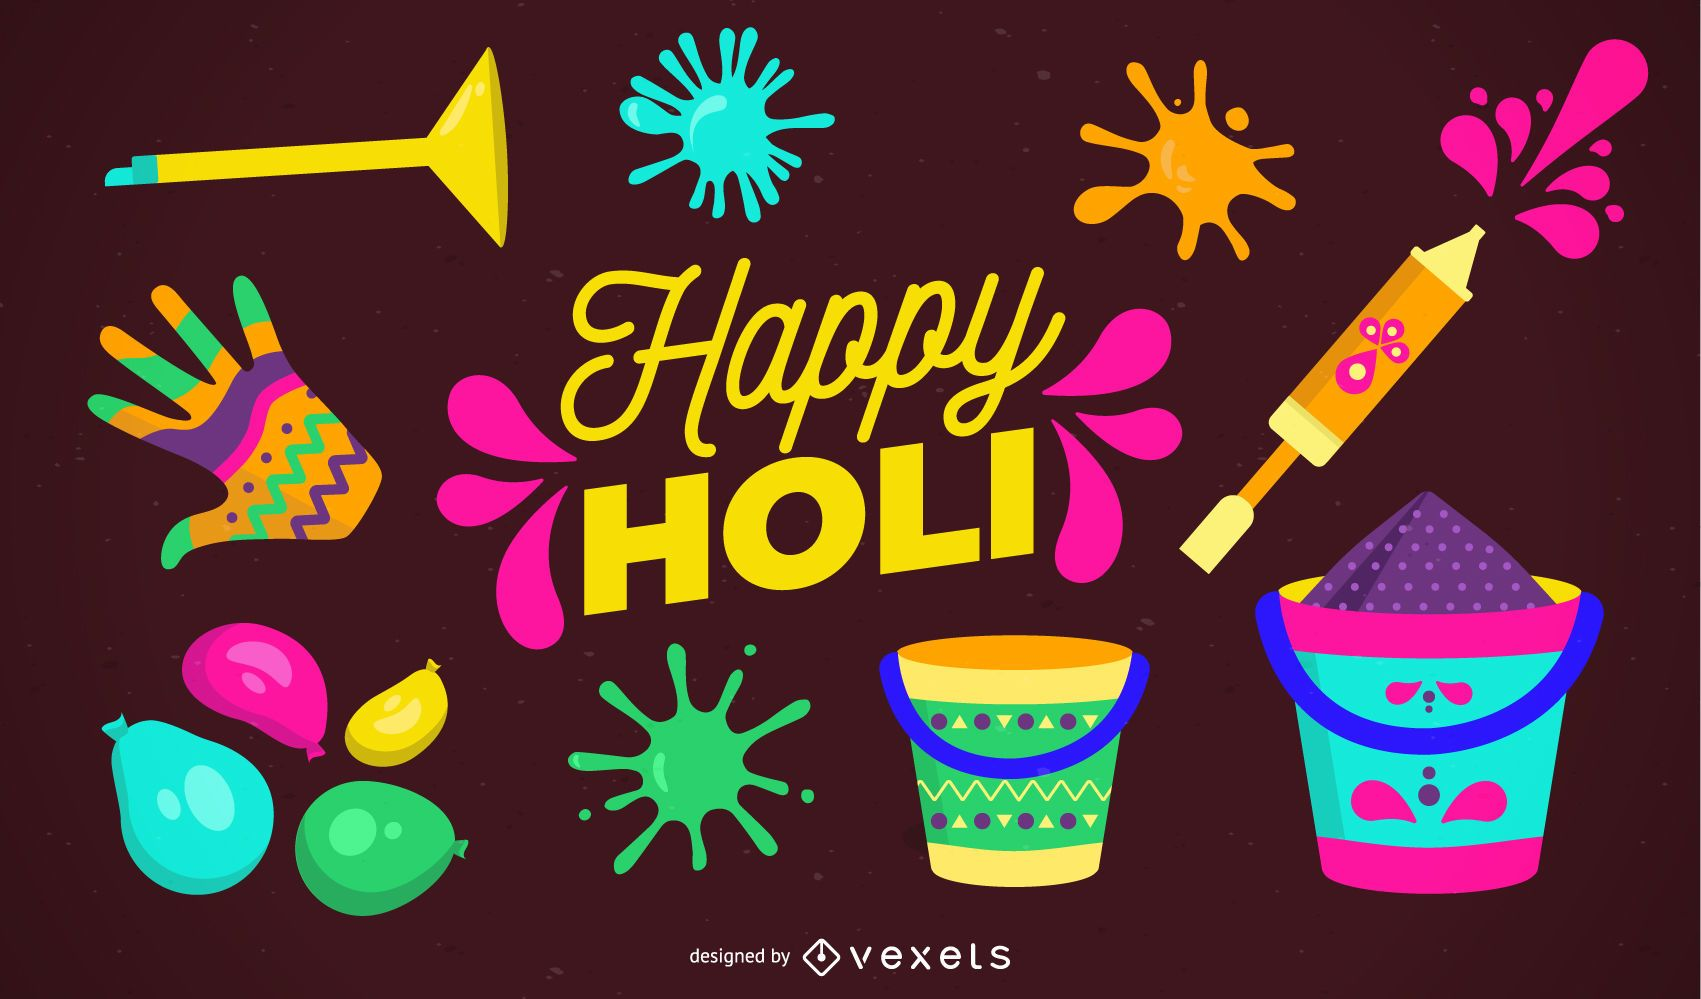 Happy Holi Illustration Design